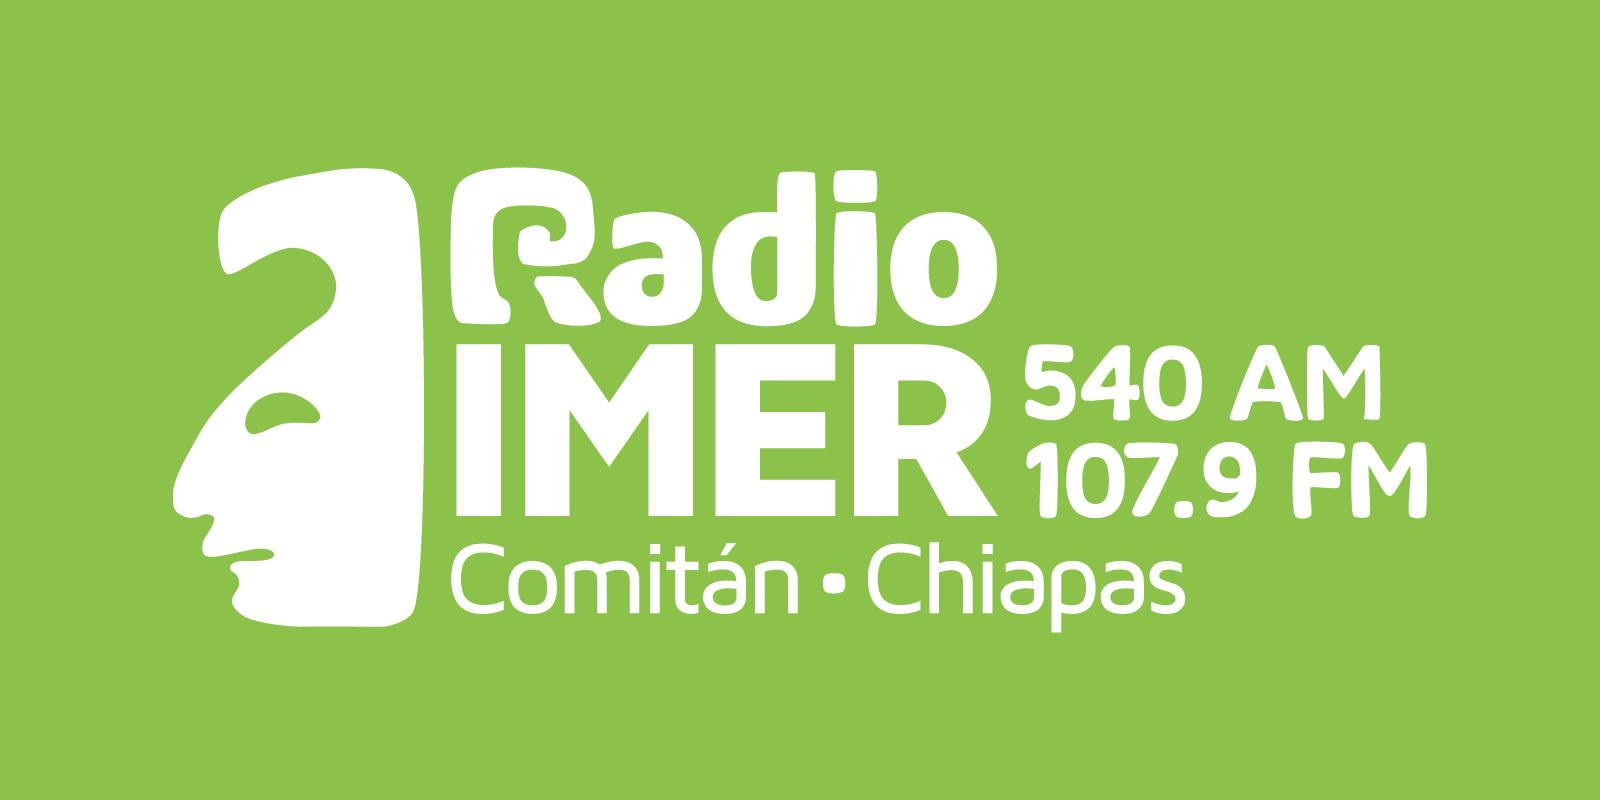 Radio IMER, 540 AM, Comitán Chiapas